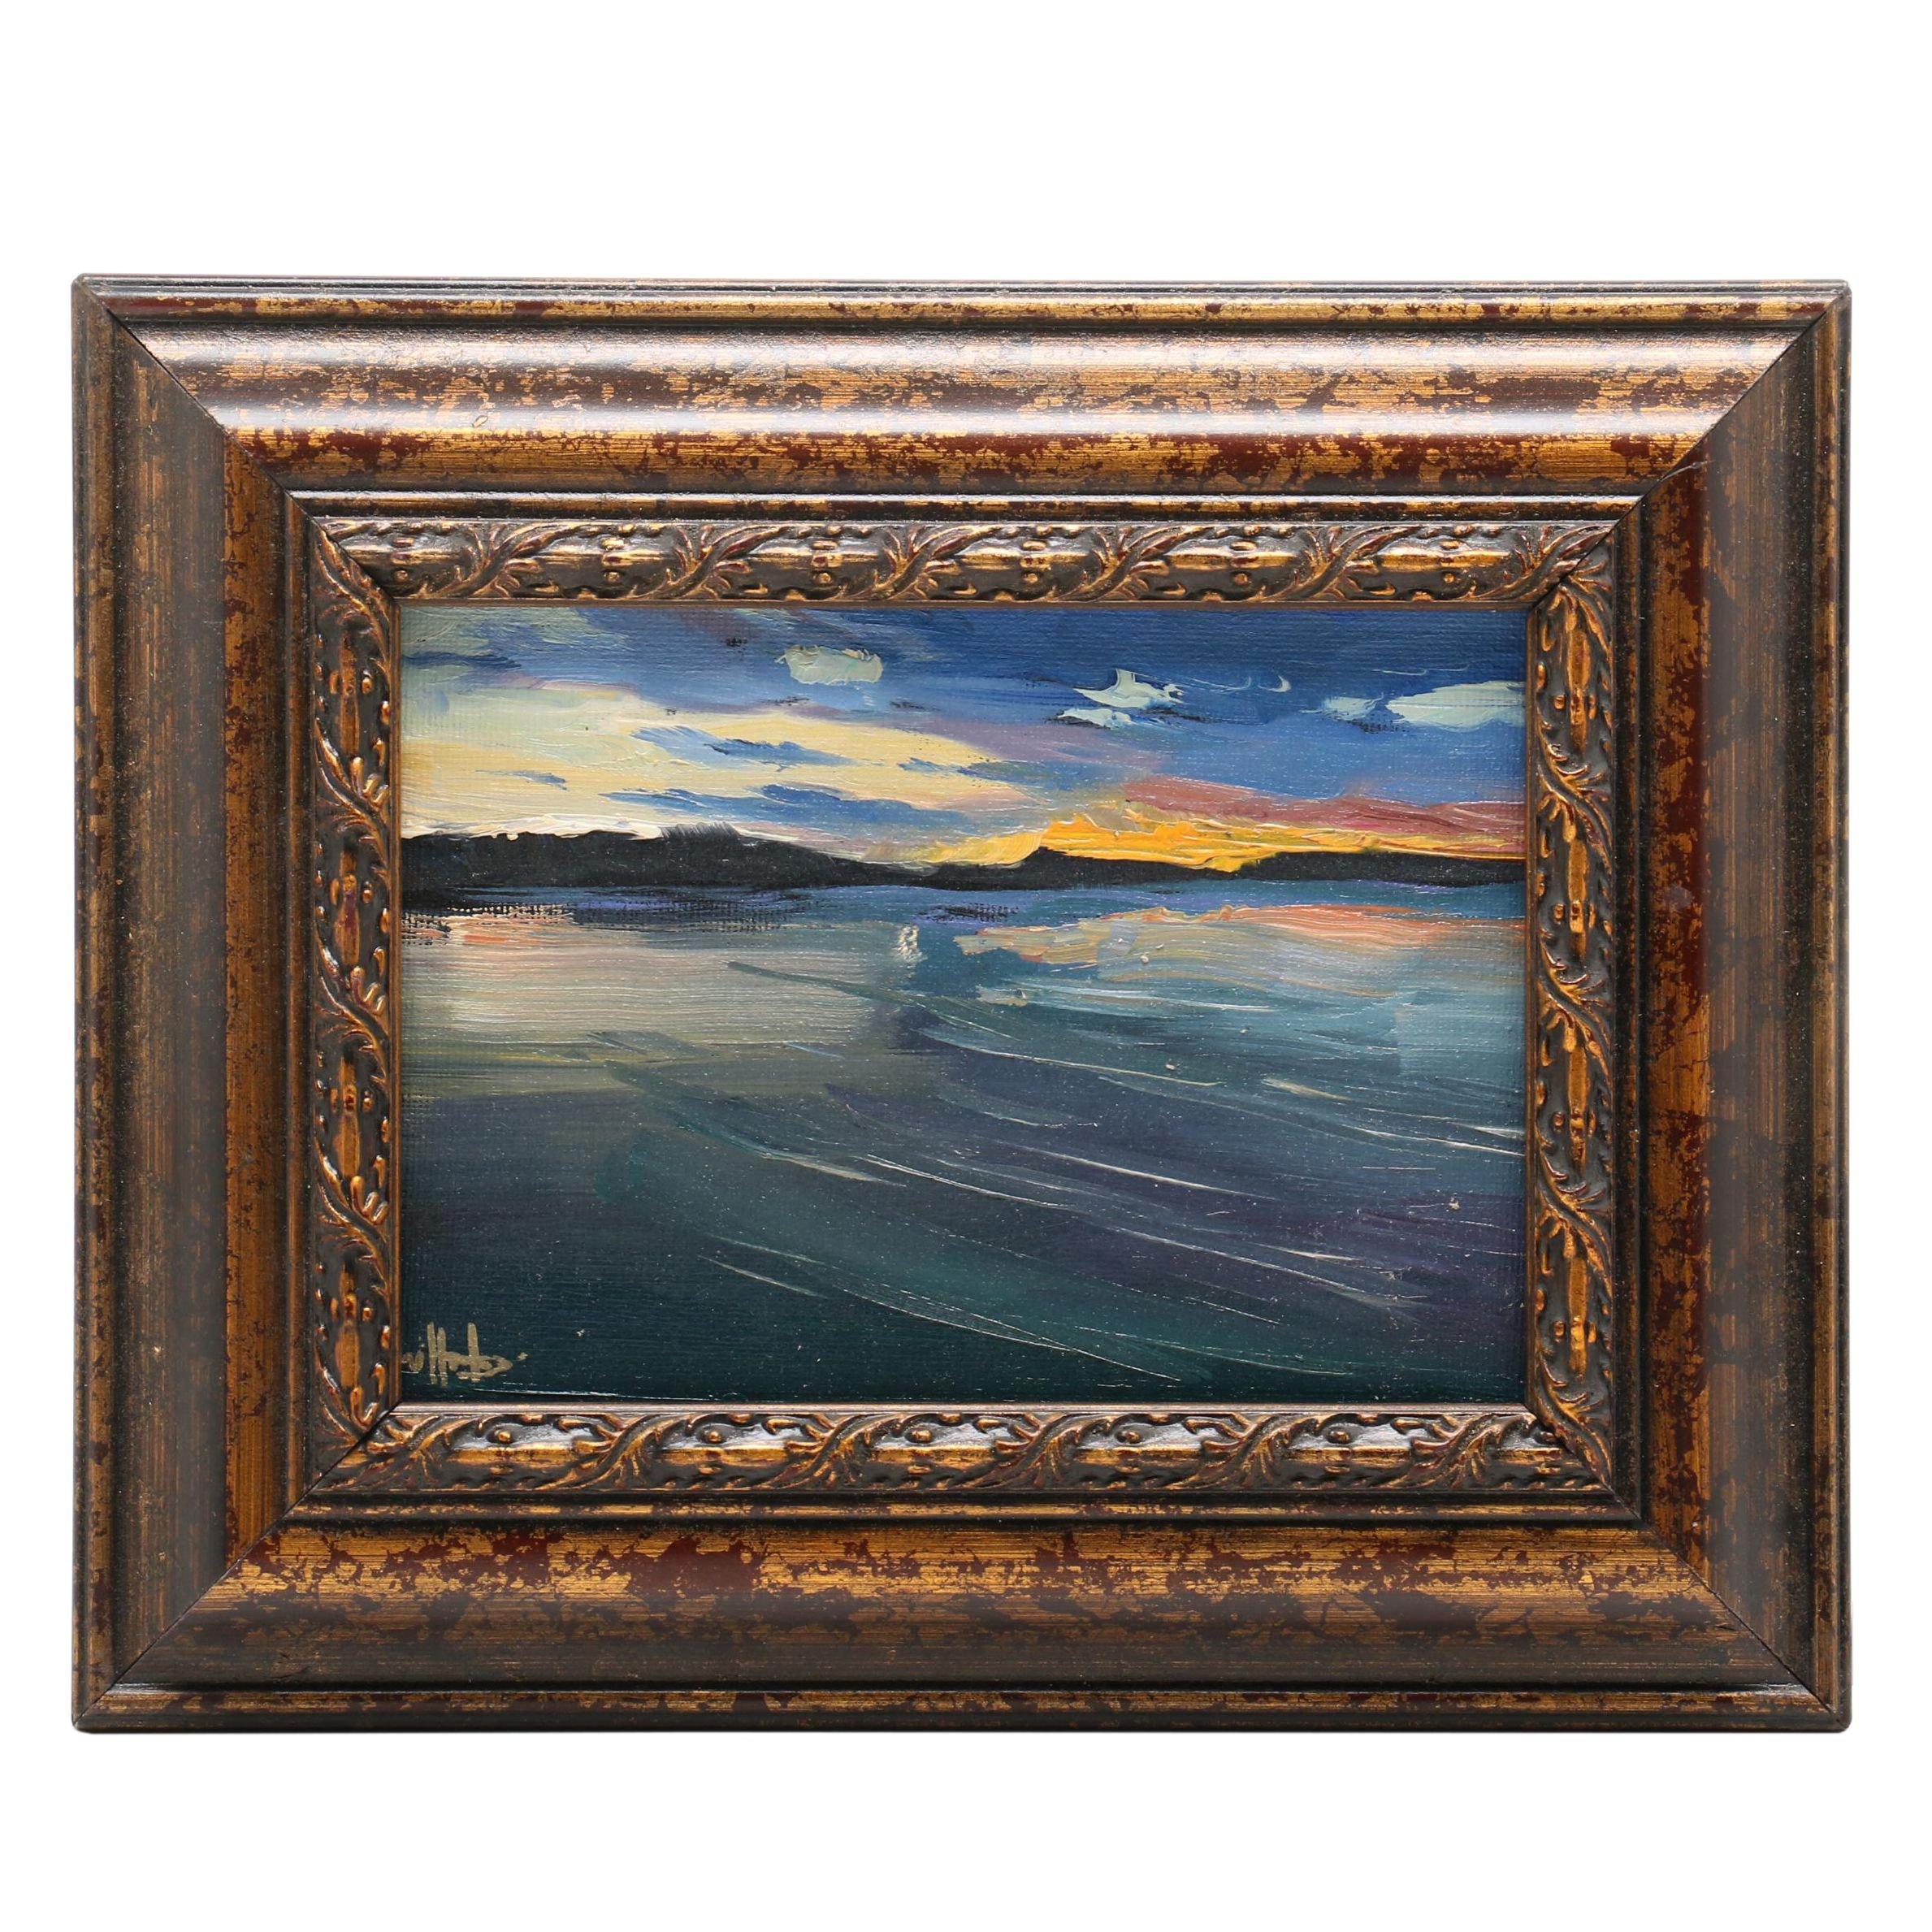 William Hawkins Oil Painting of Lake Scene at Sunset